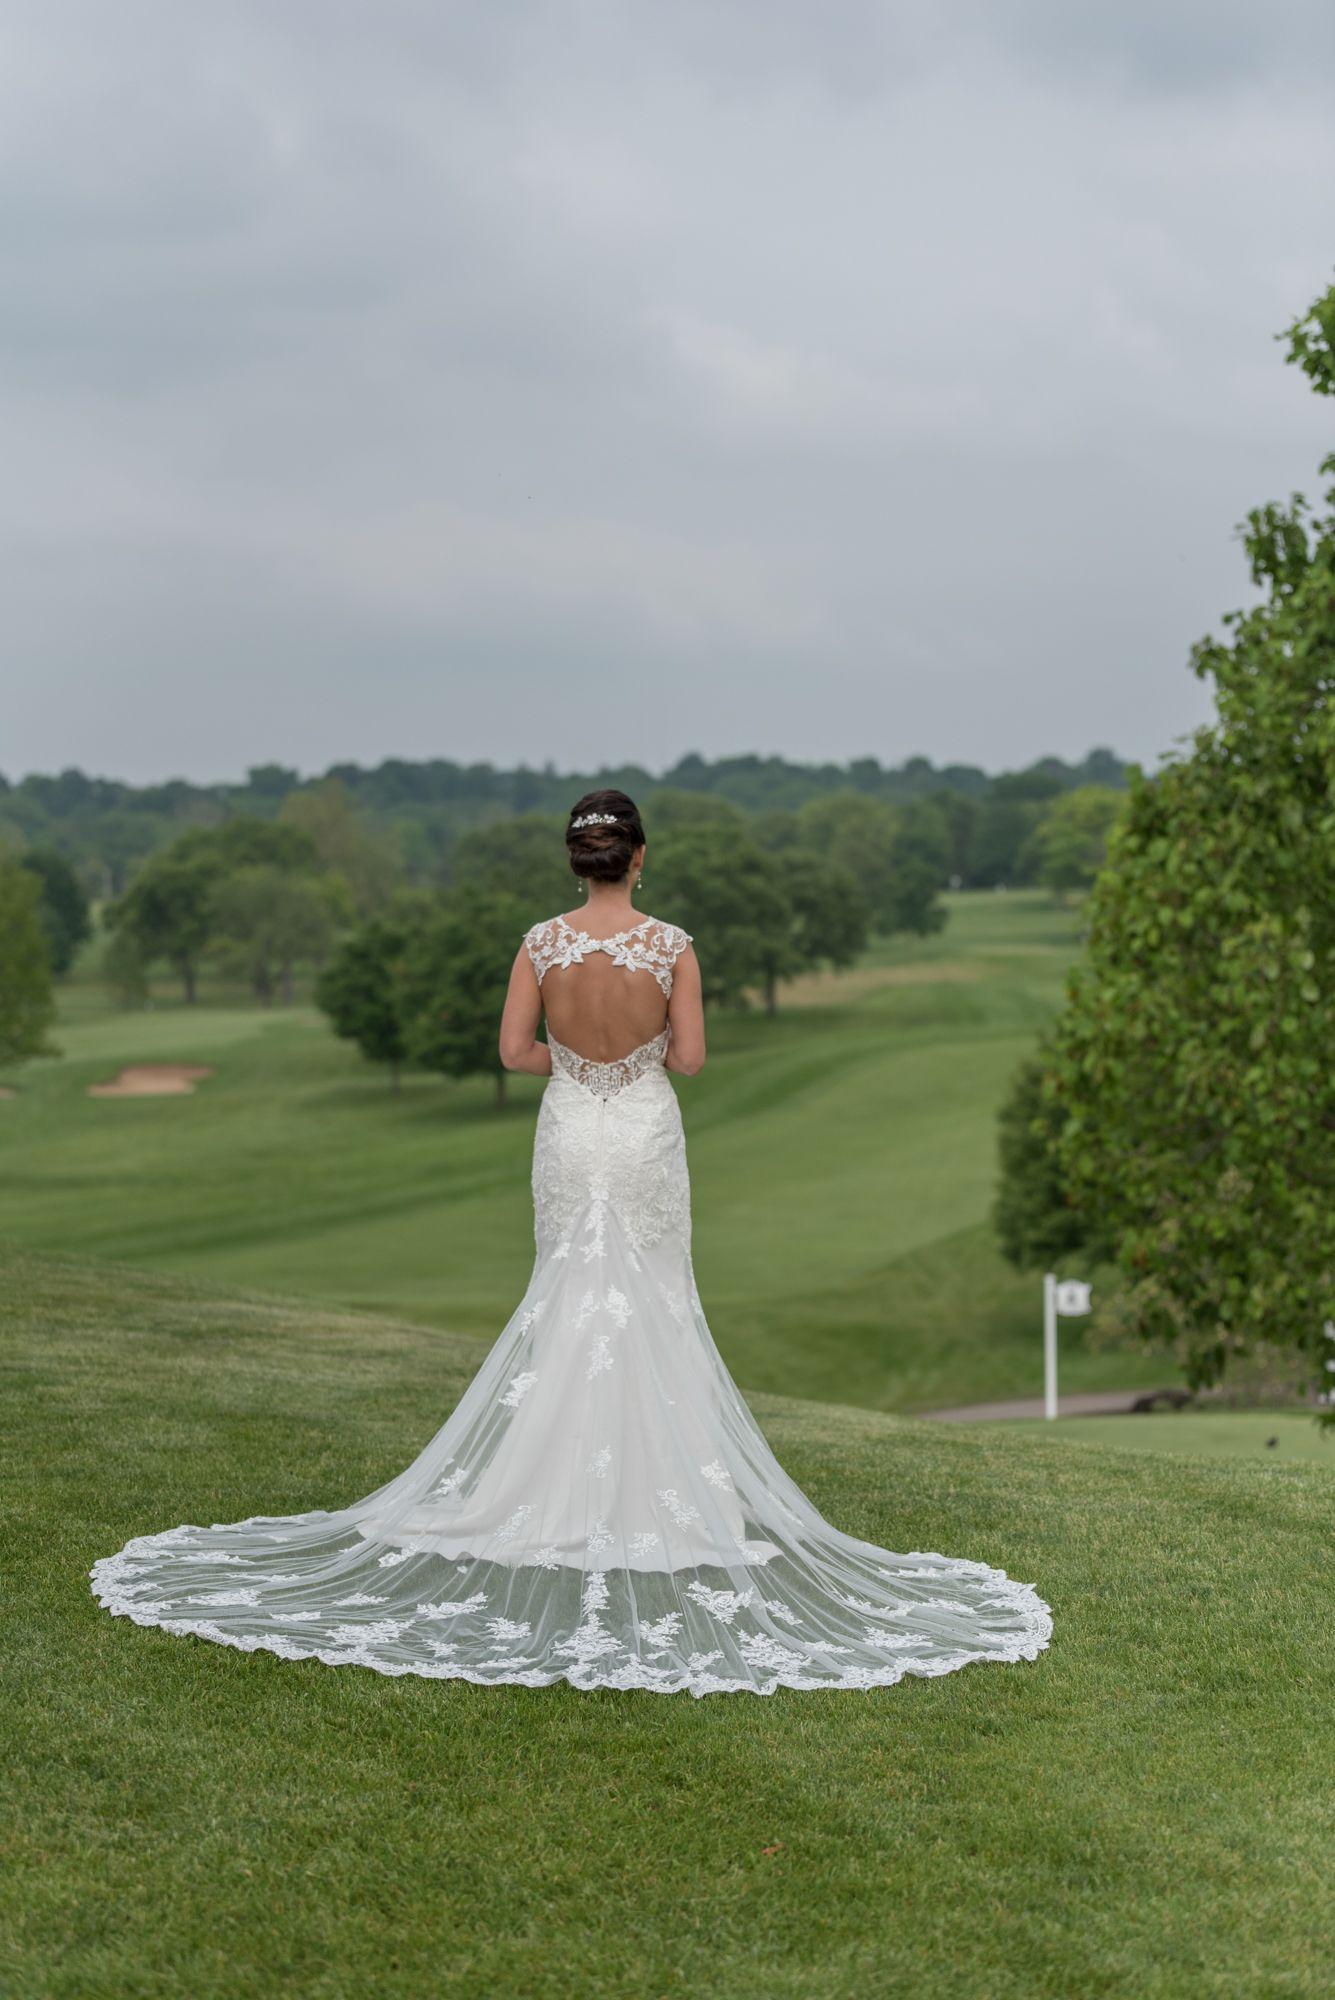 Ncr country club wedding photography dayton golf course wedding